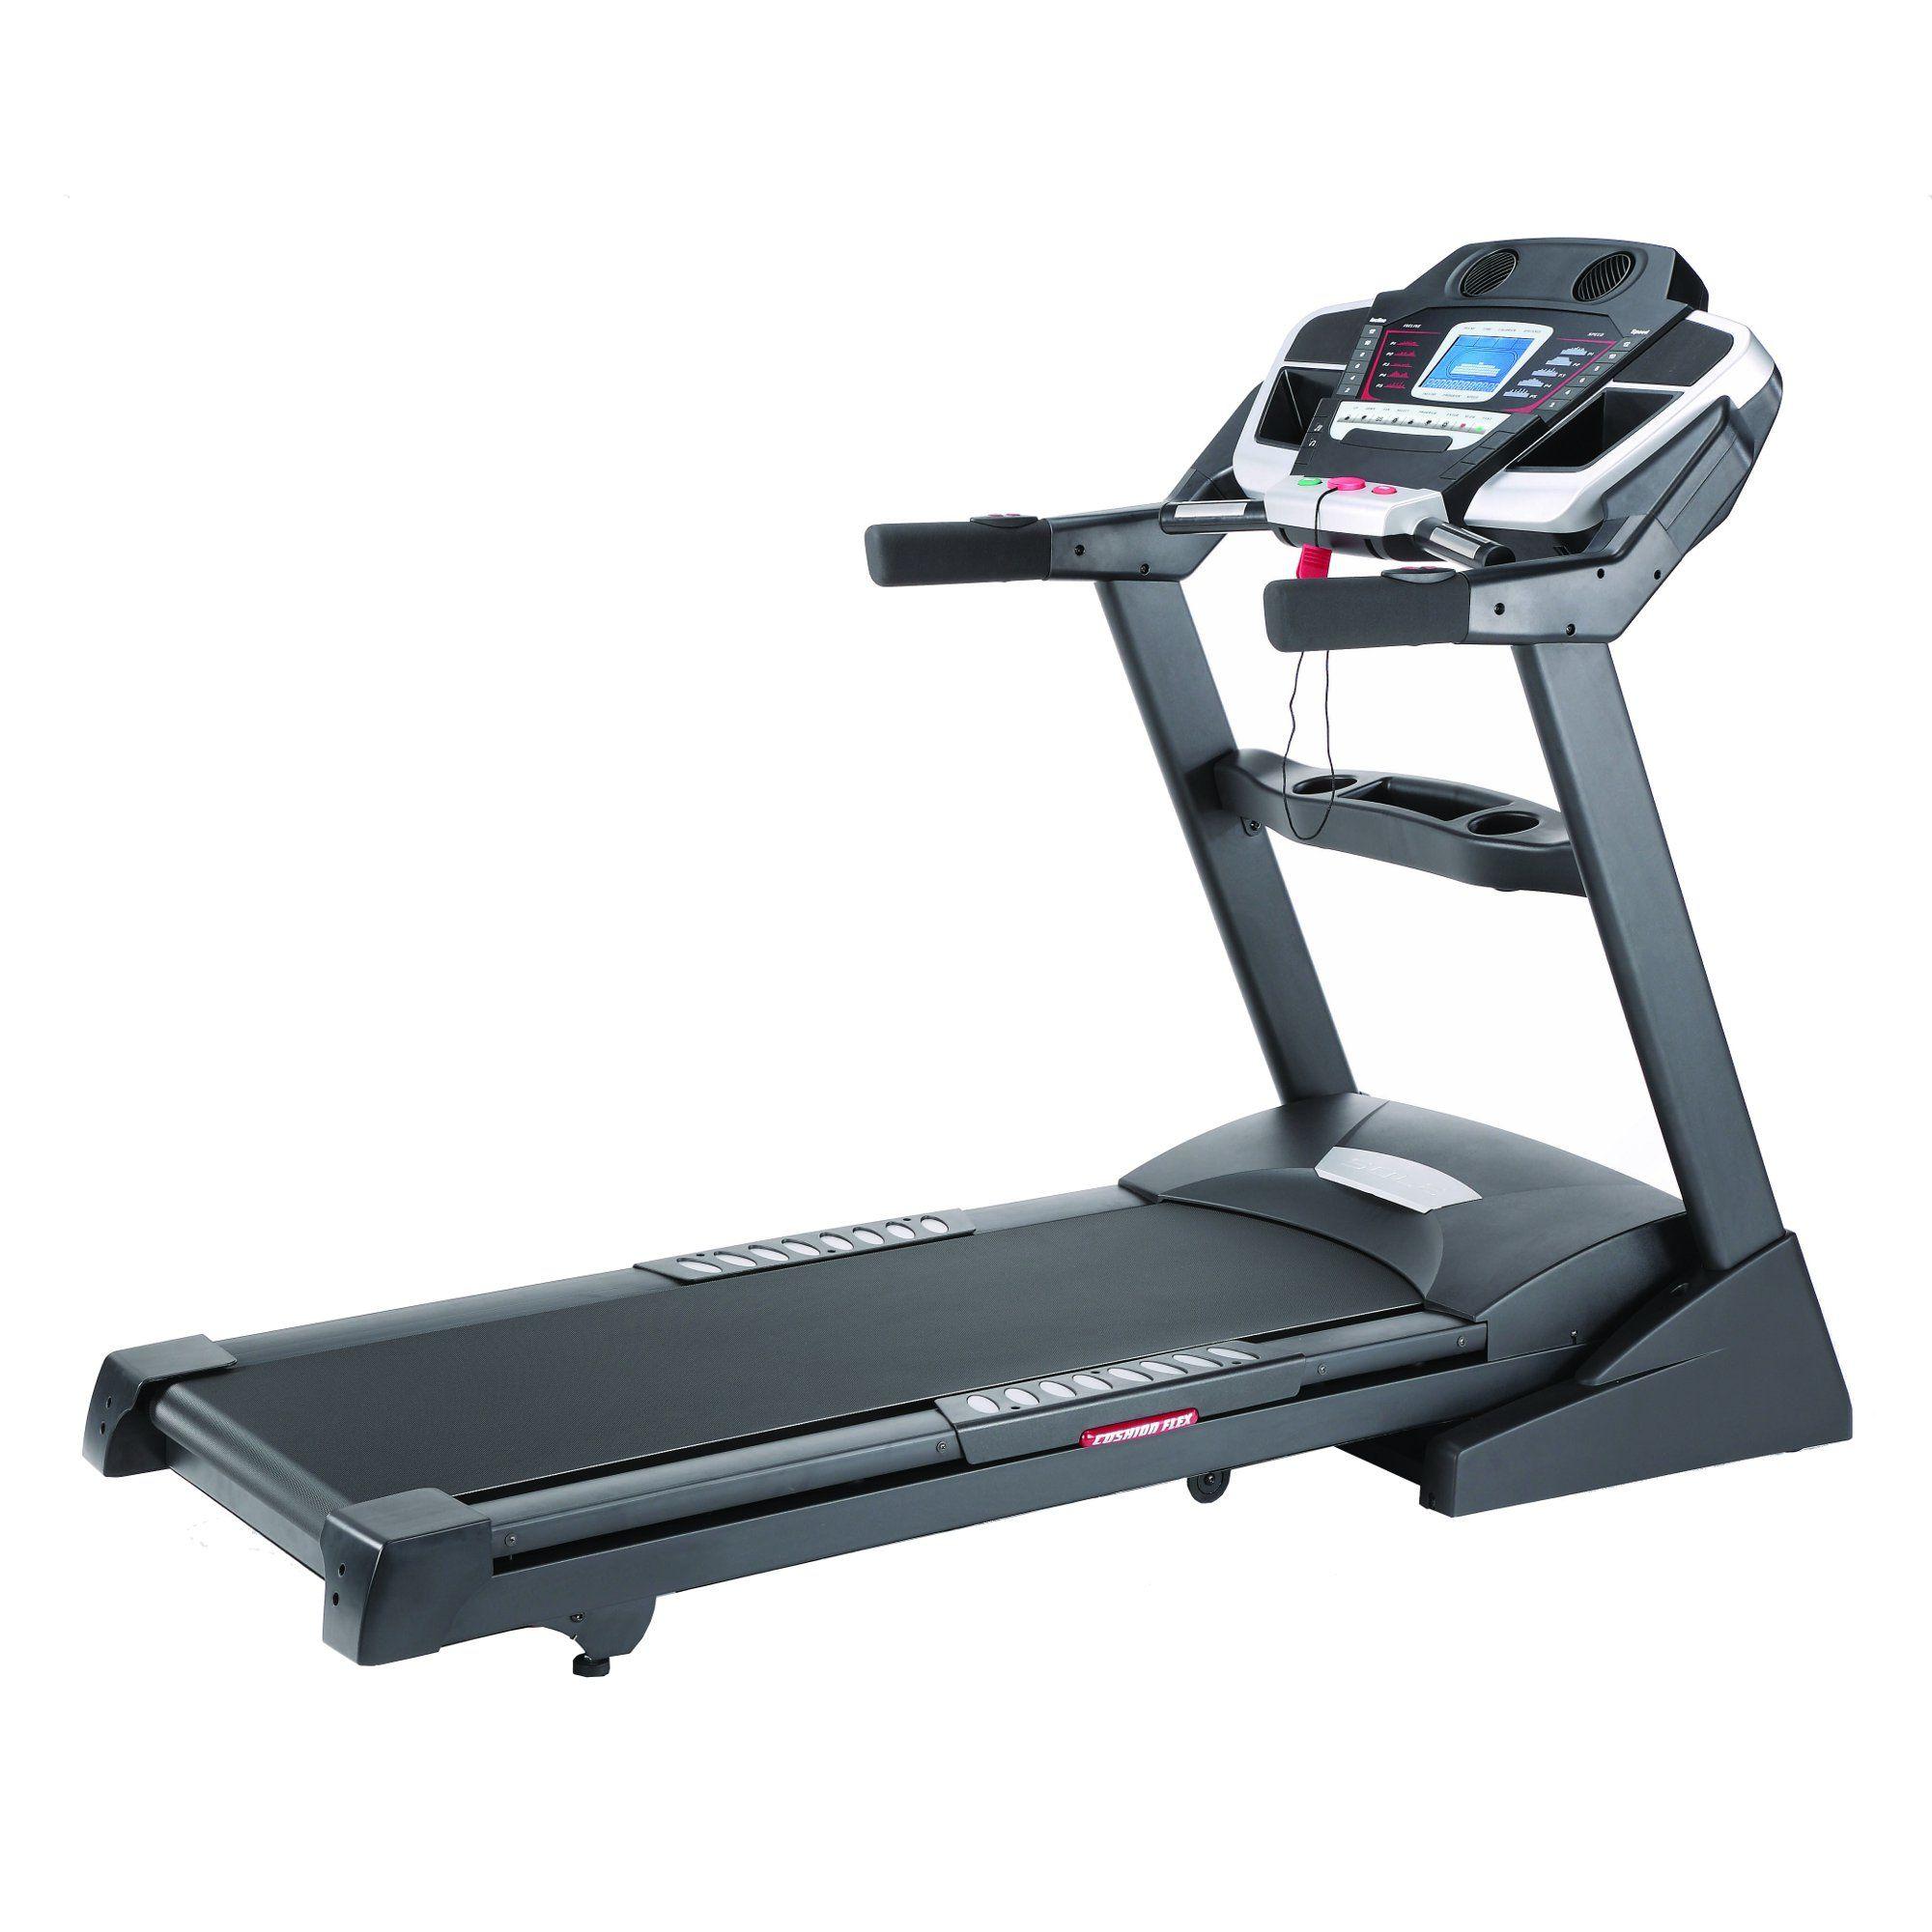 download golds gym 450 treadmill repair manual free